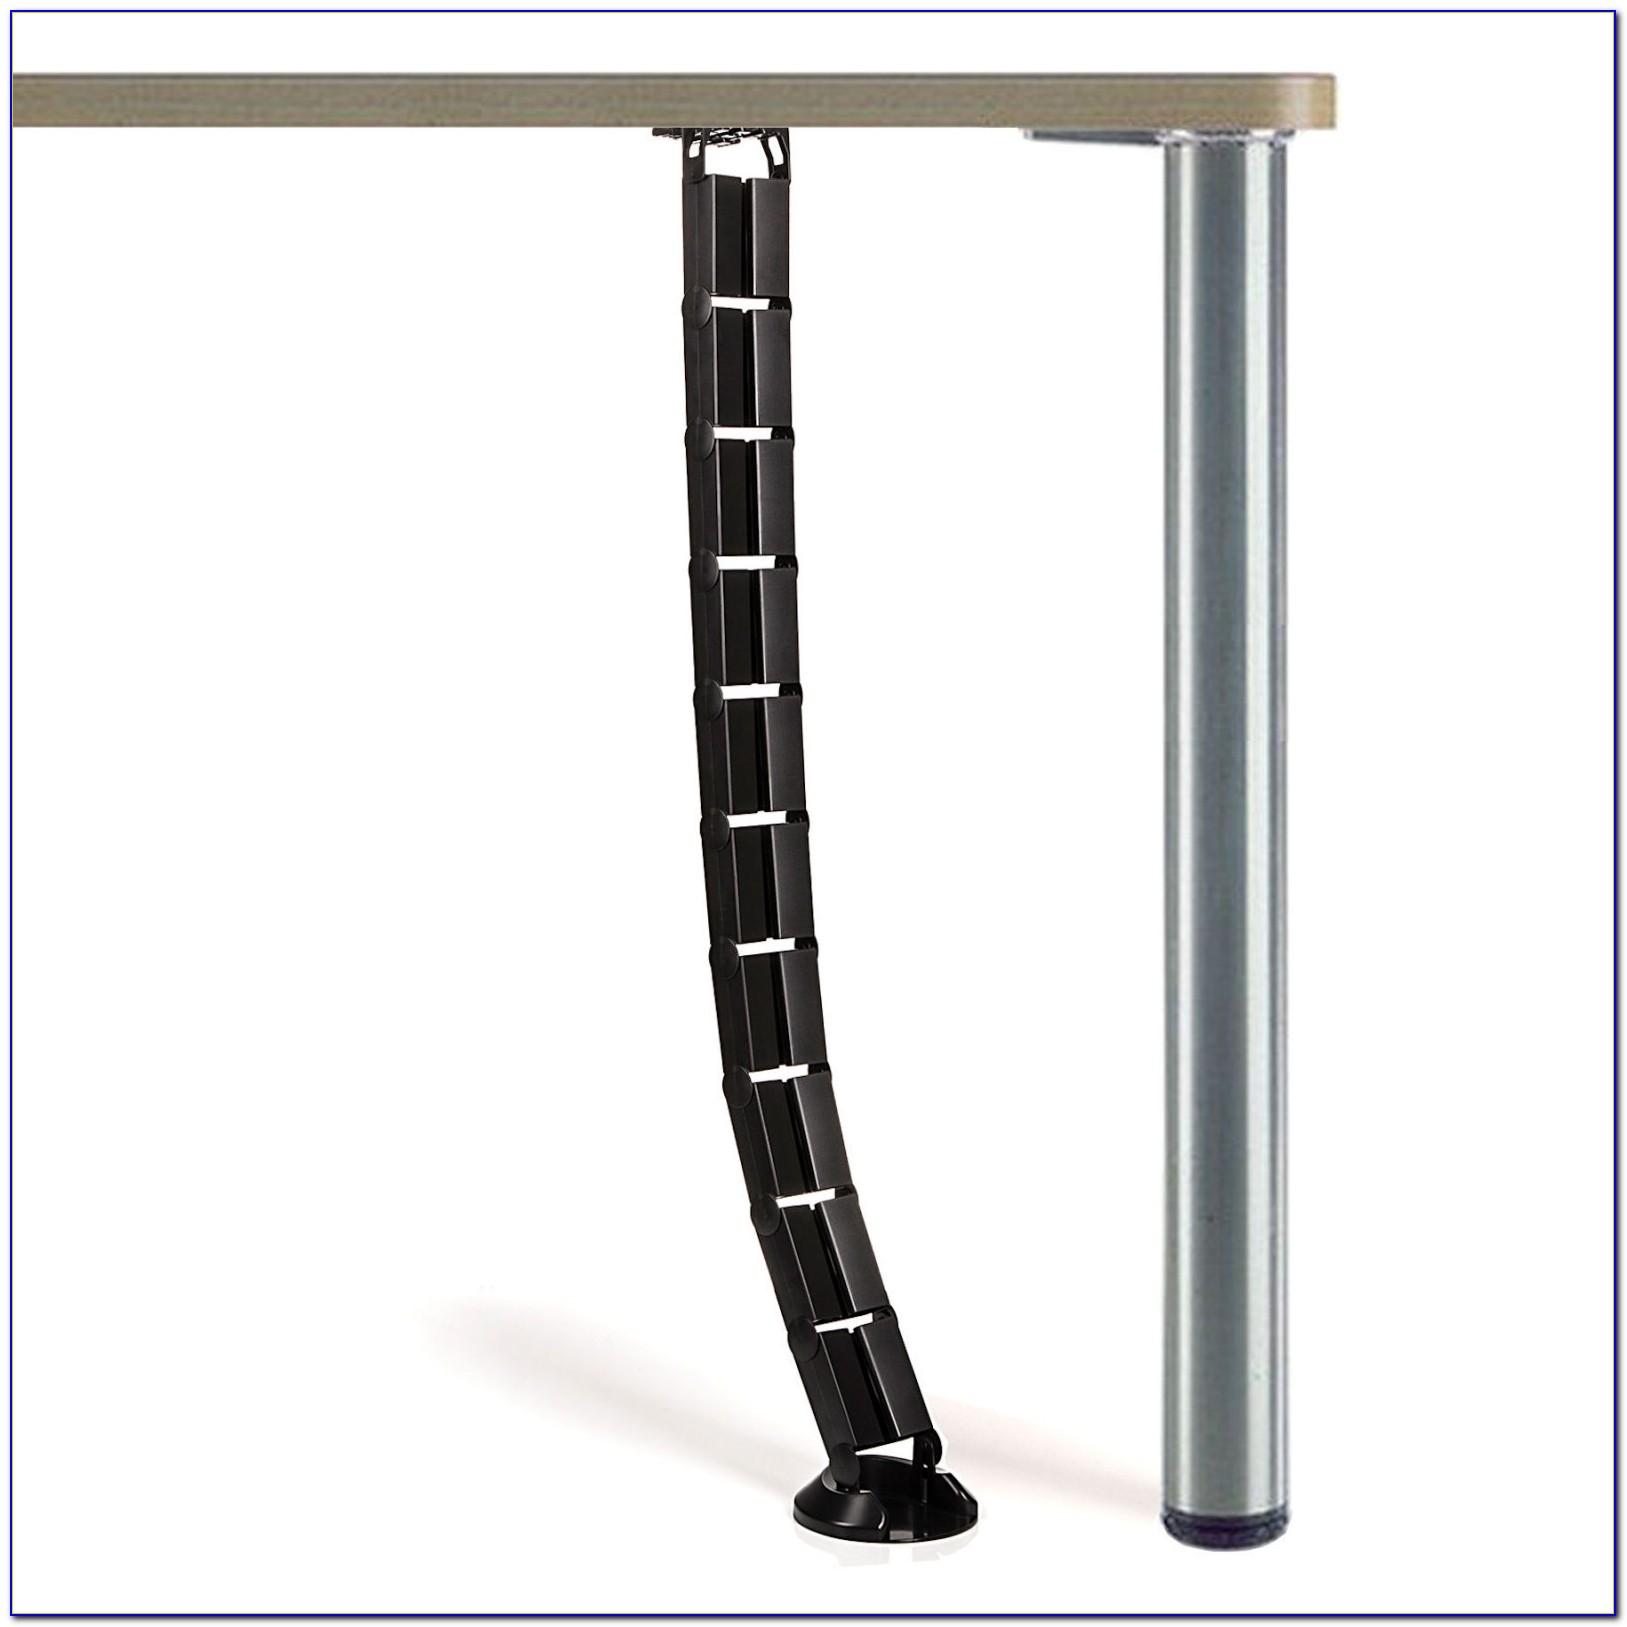 Kabelkanal Schreibtisch Vertikal